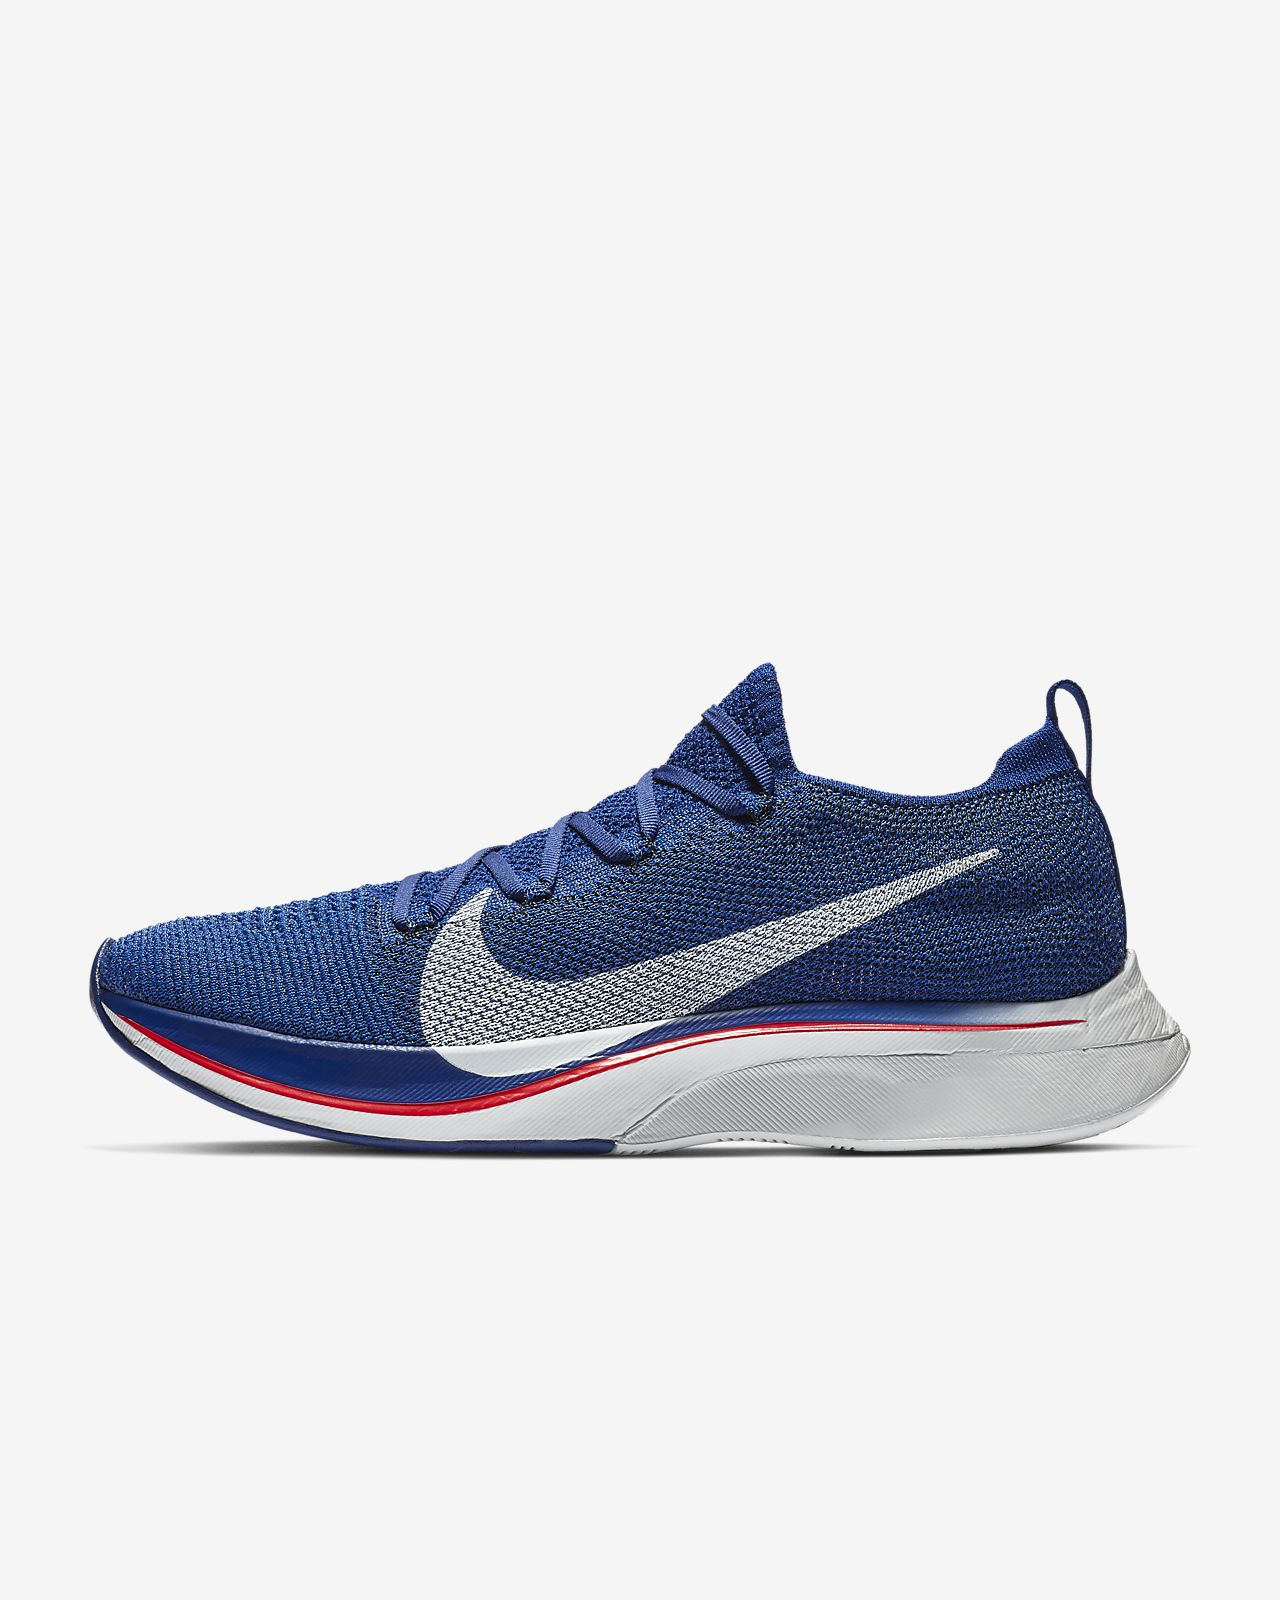 a31ecb2b33174 Nike Vaporfly 4% Flyknit Zapatillas de running. Nike.com ES